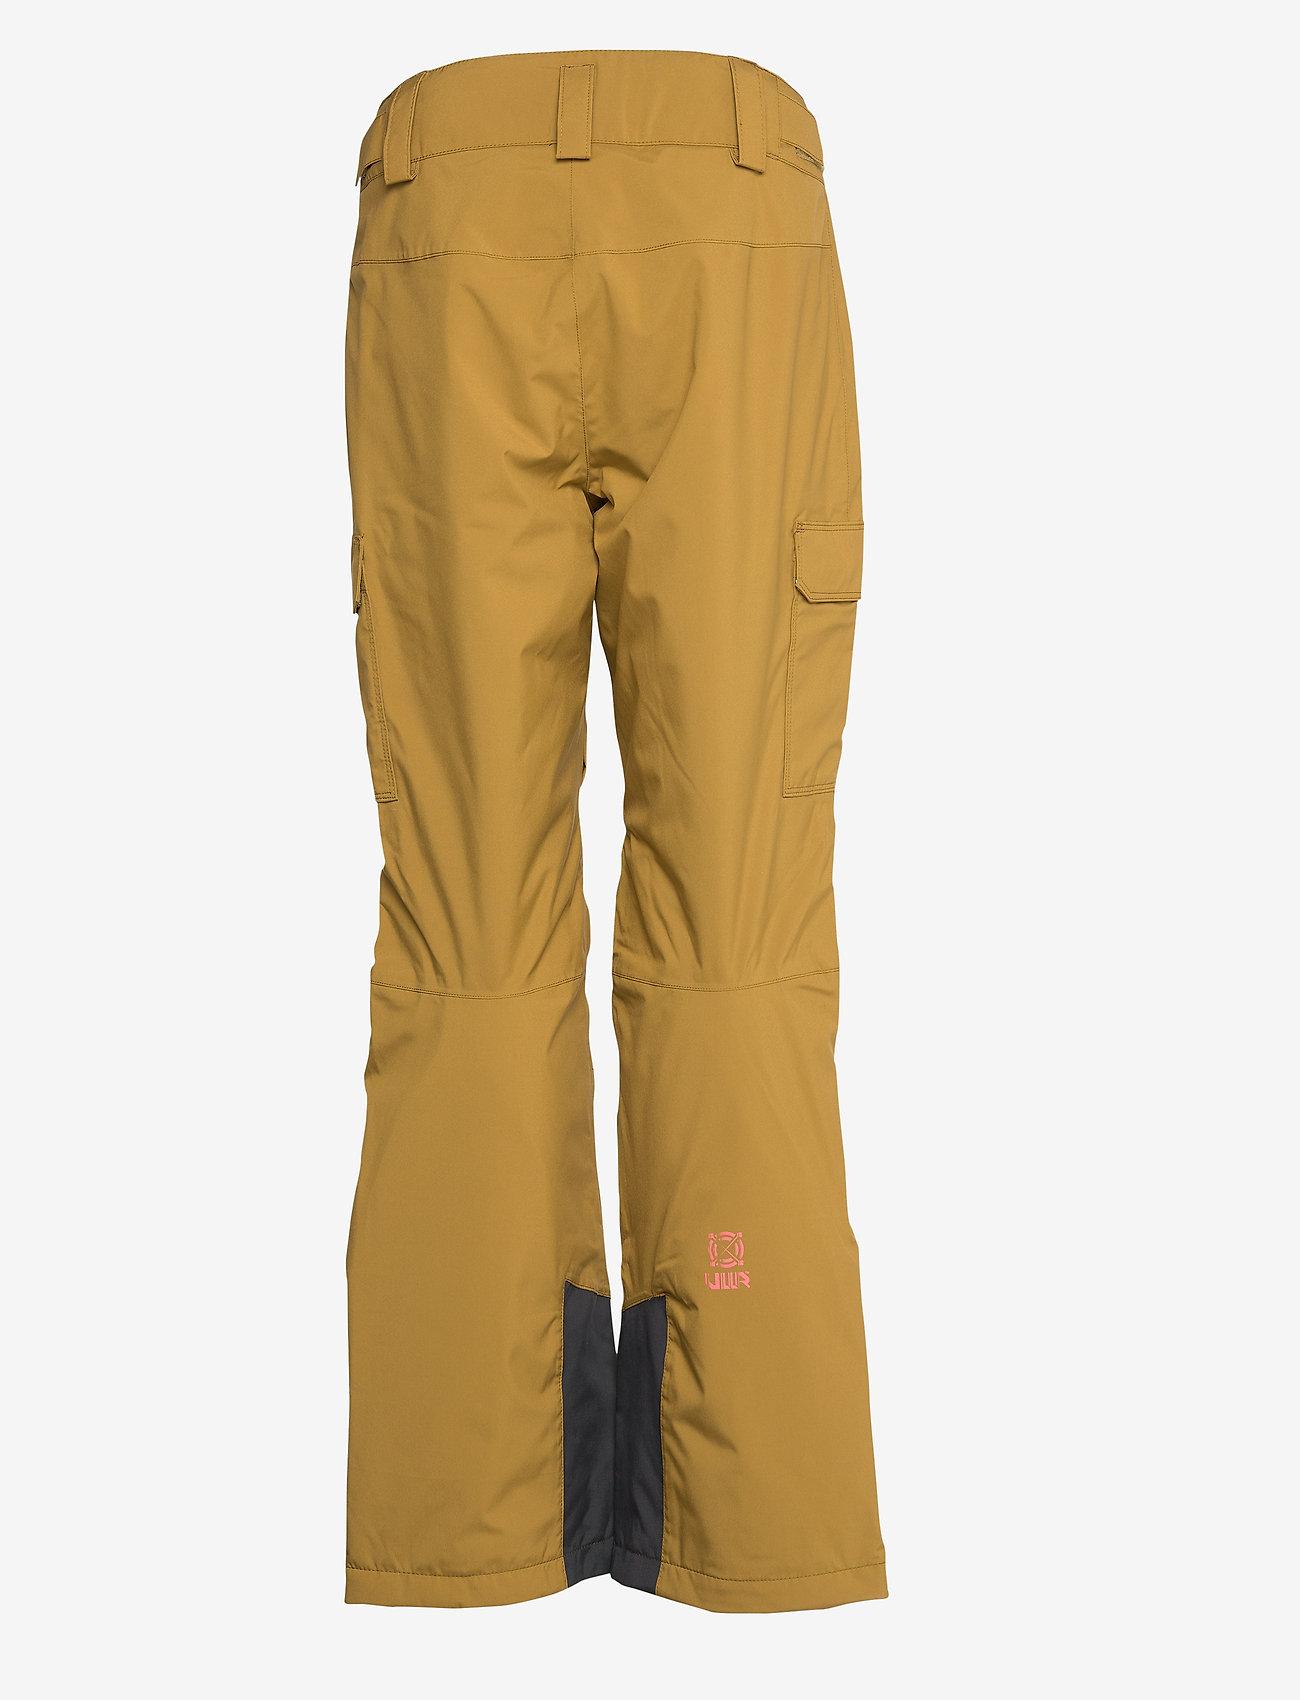 Helly Hansen - W SWITCH CARGO INSULATED PANT - skibroeken - uniform green - 1